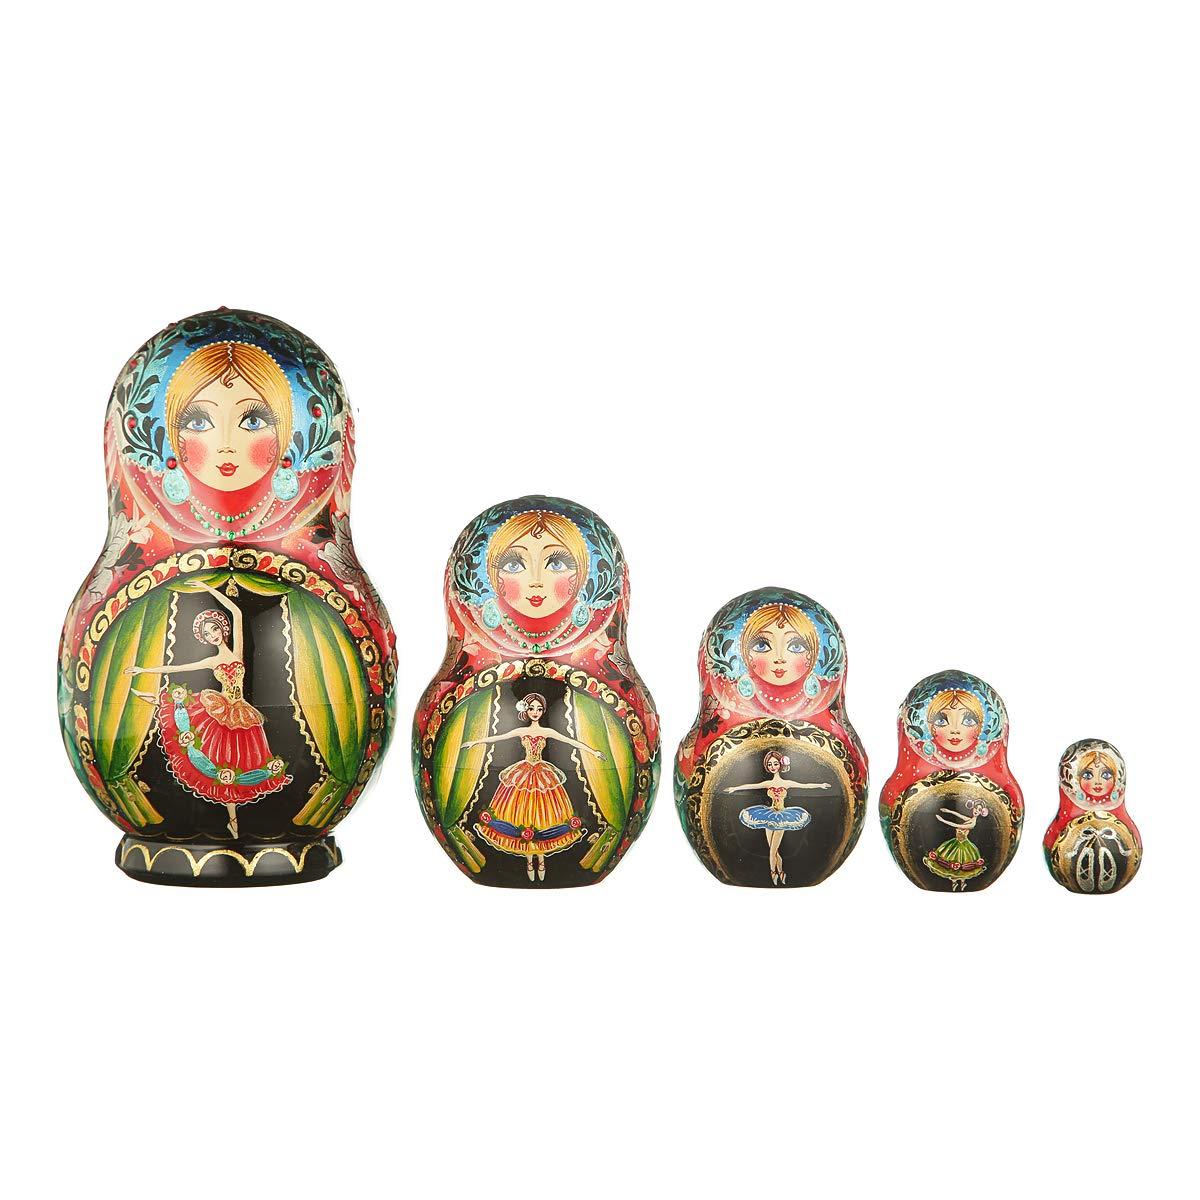 danila-souvenirs Russian Wooden Nesting Dolls Hand Painted Matryoshka 5 pcs Set Ballet 6.5'' by danila-souvenirs (Image #1)